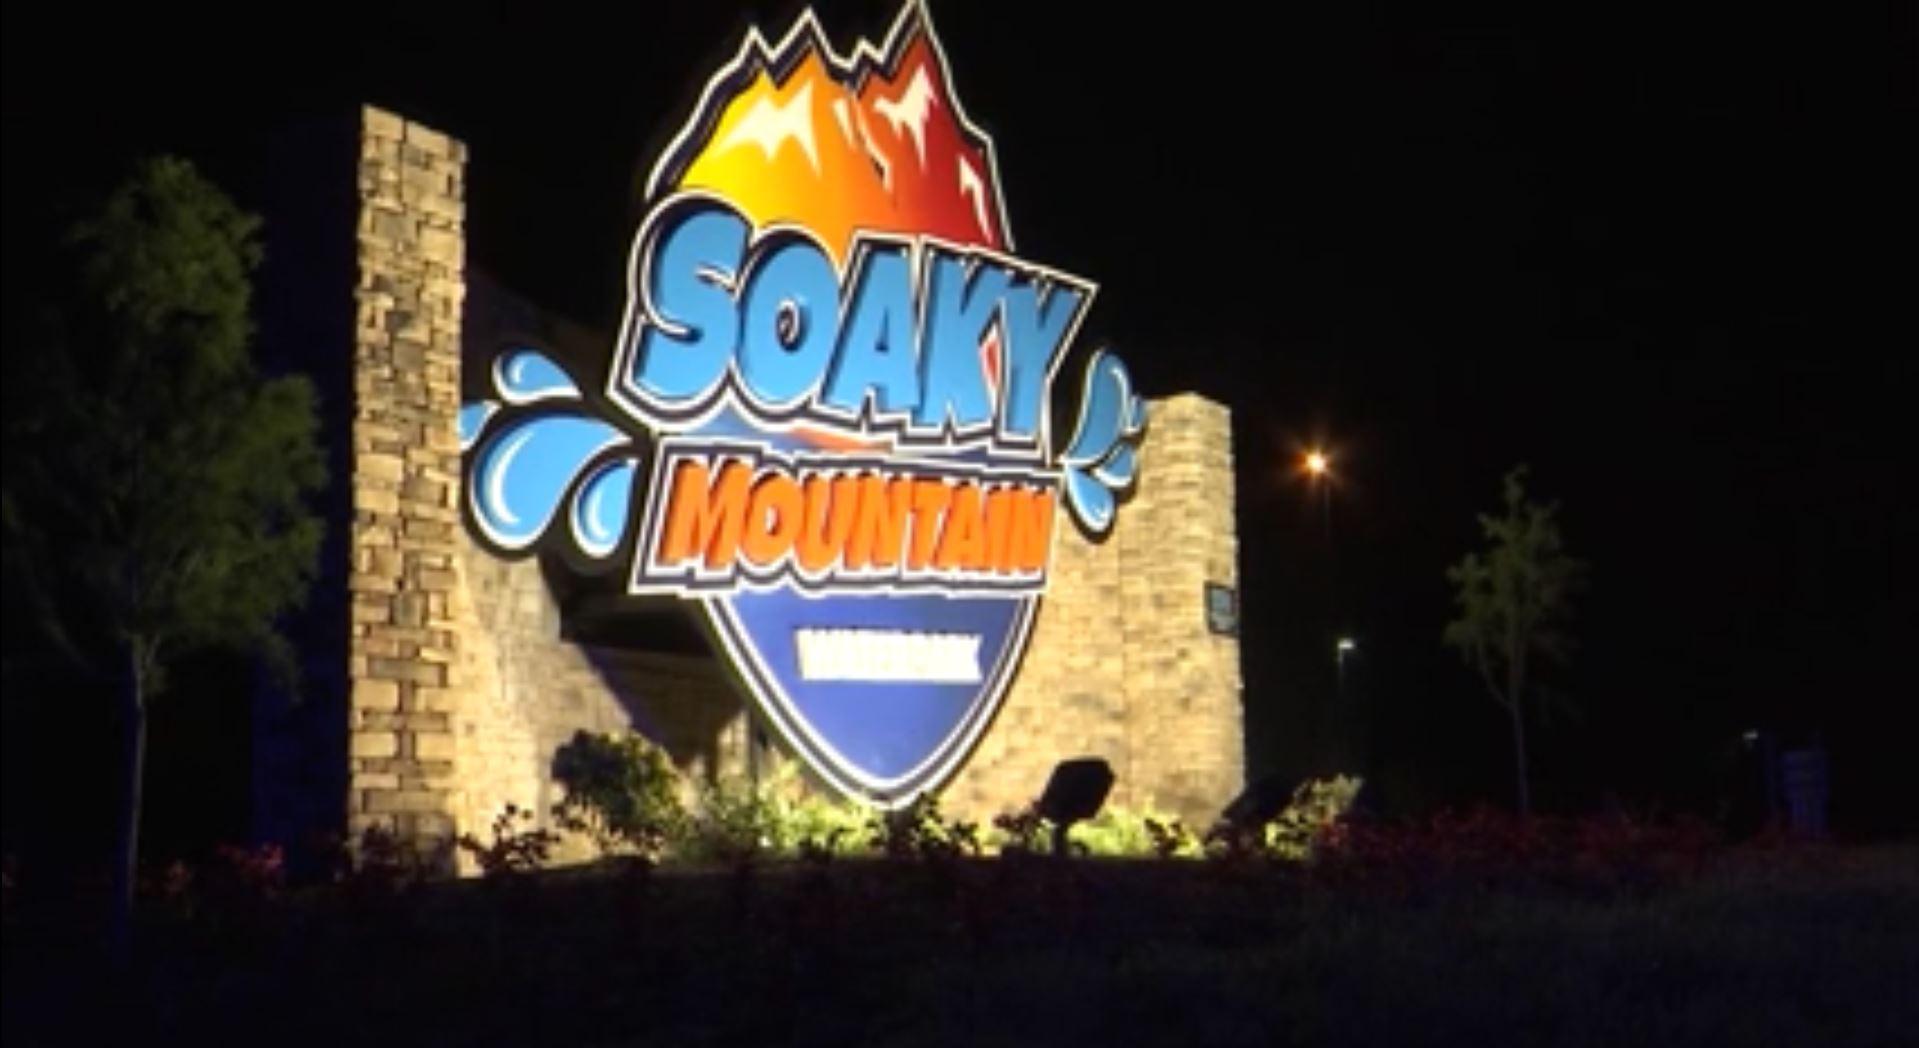 Soaky Mountian waterpark sign night of shooting